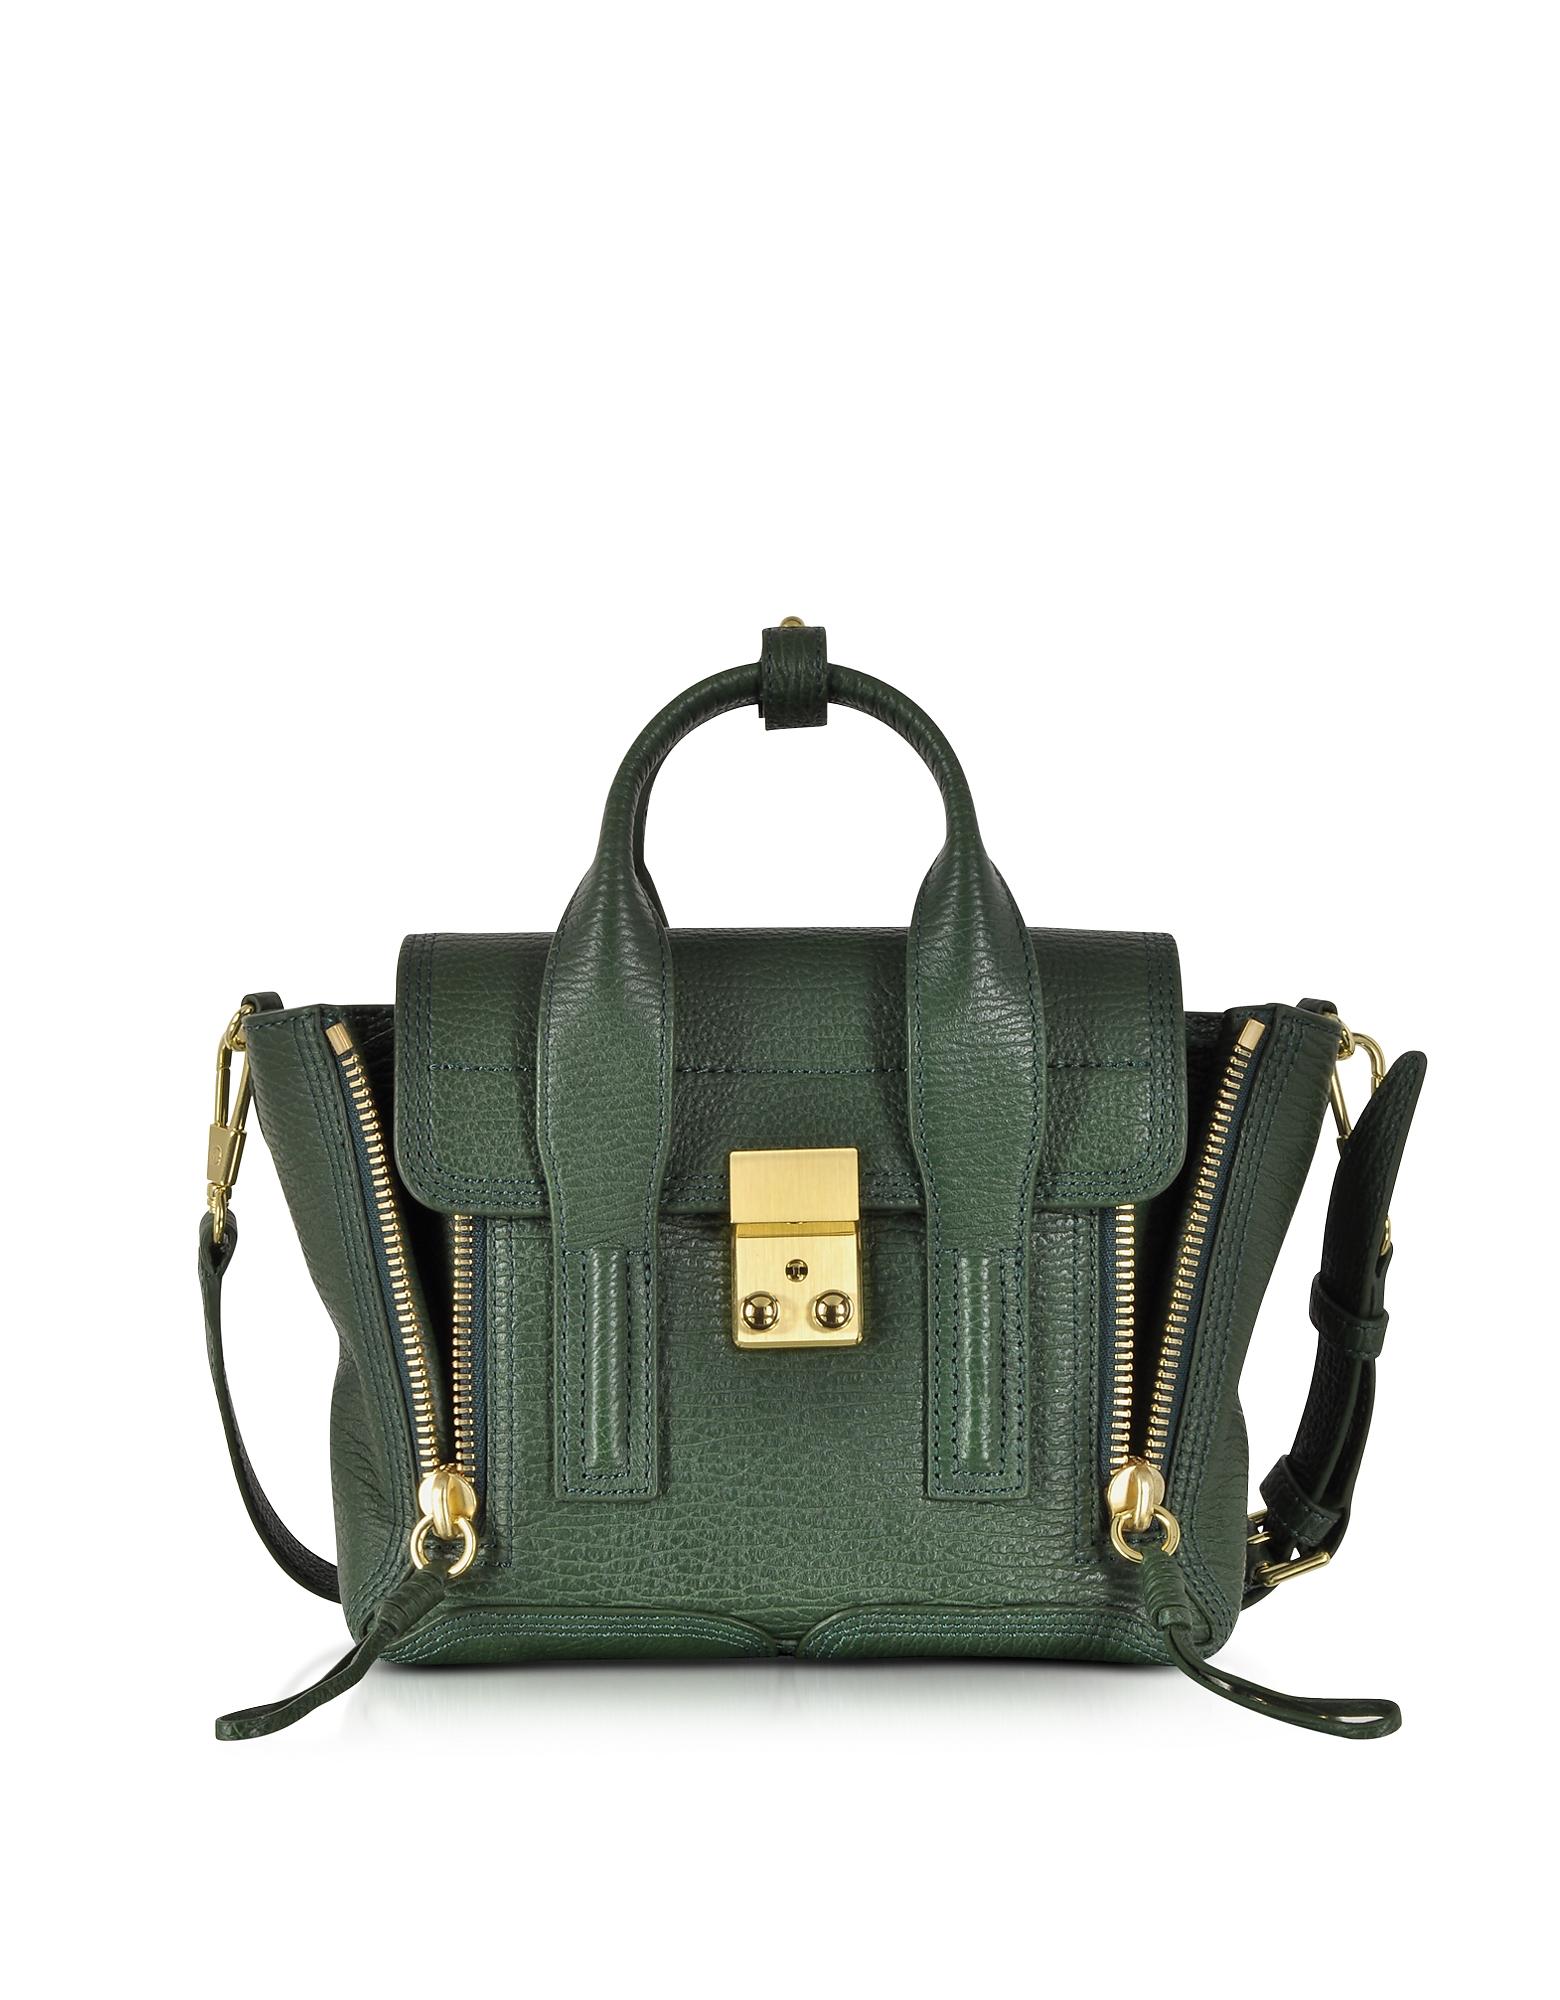 3.1 Phillip Lim Handbags, Pashli Mini Satchel w/Shoulder Strap